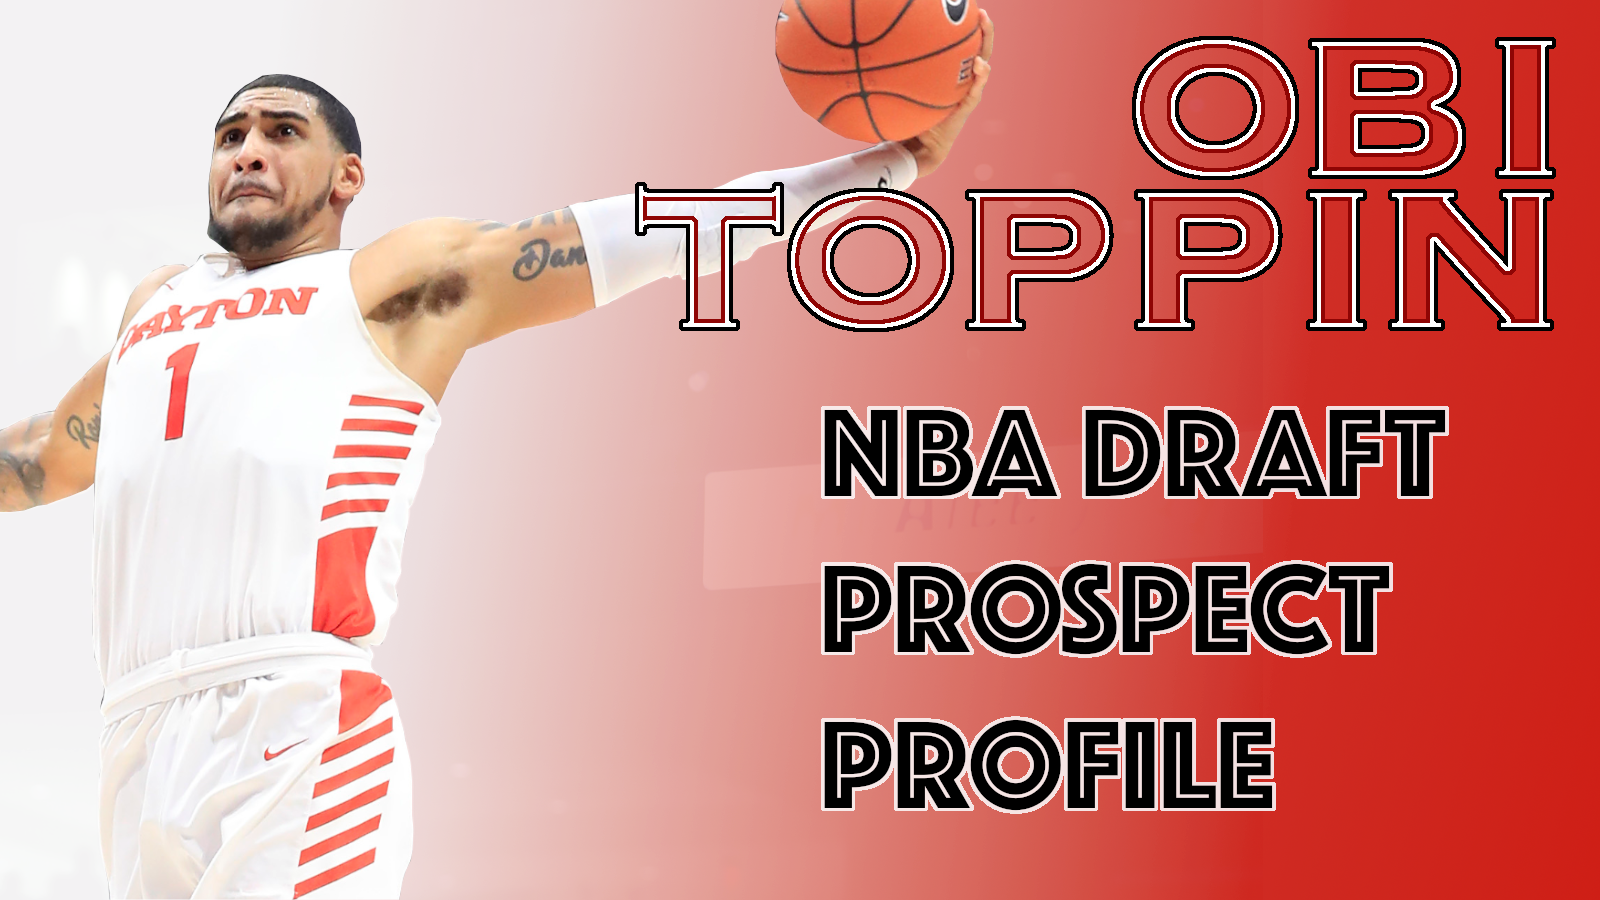 Nba Draft Prospect Profile Why Obi Toppin Isn T Worth The No 1 Pick